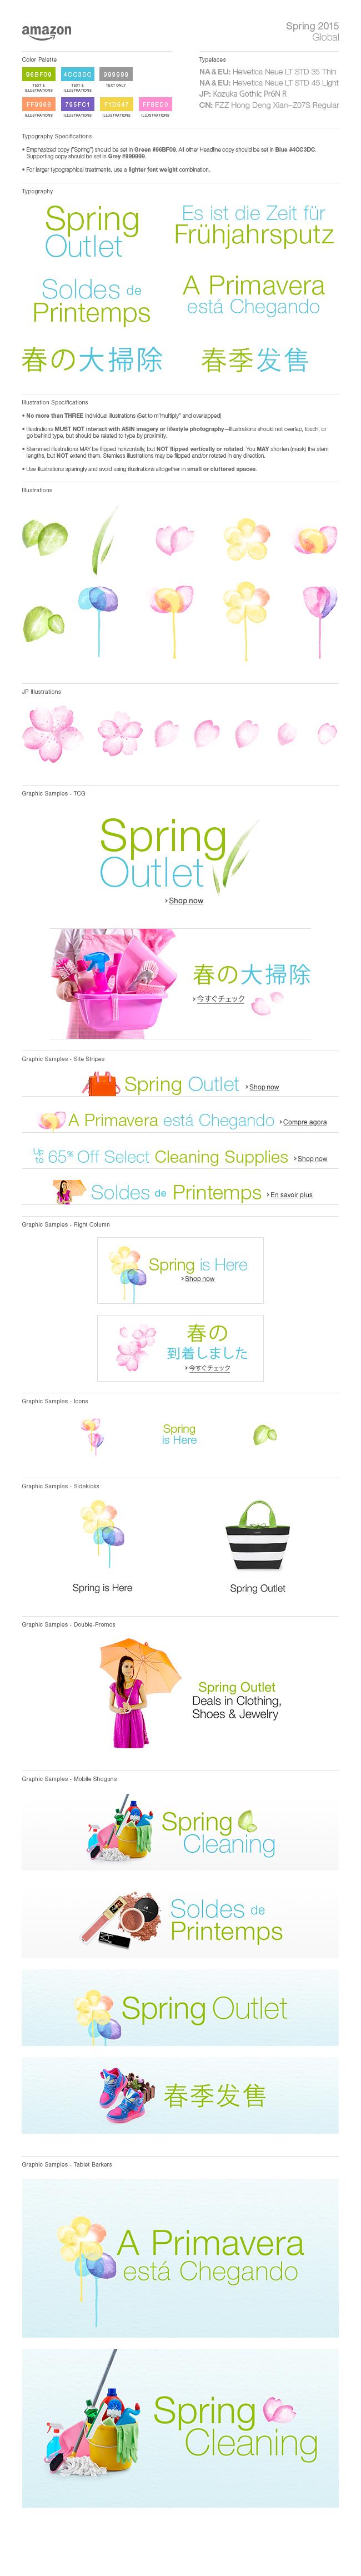 2015_spring_styleguide.jpg